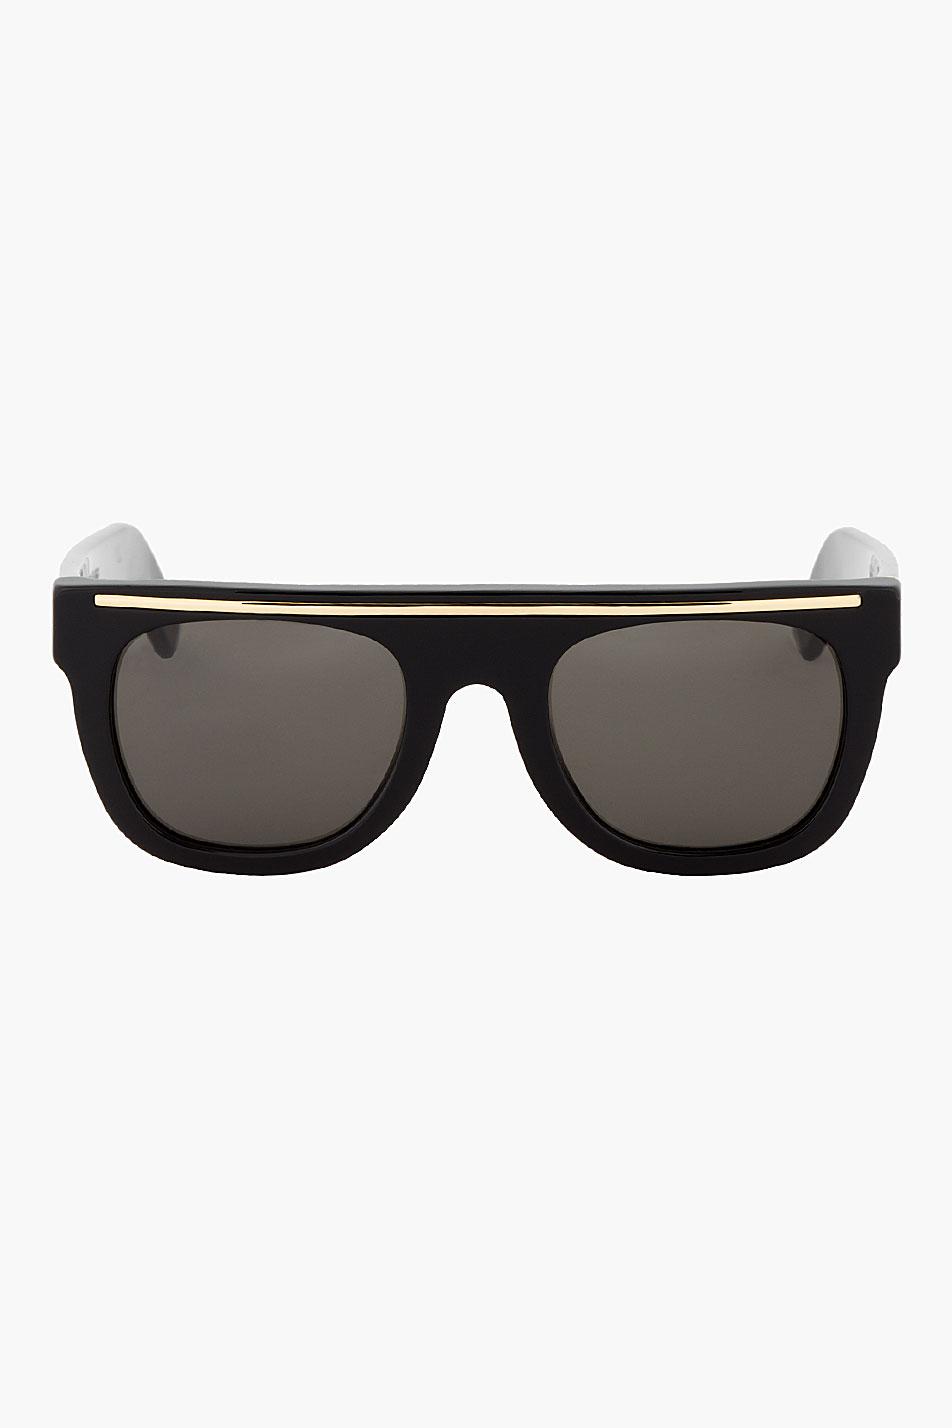 Super black flat top chicano sunglasses